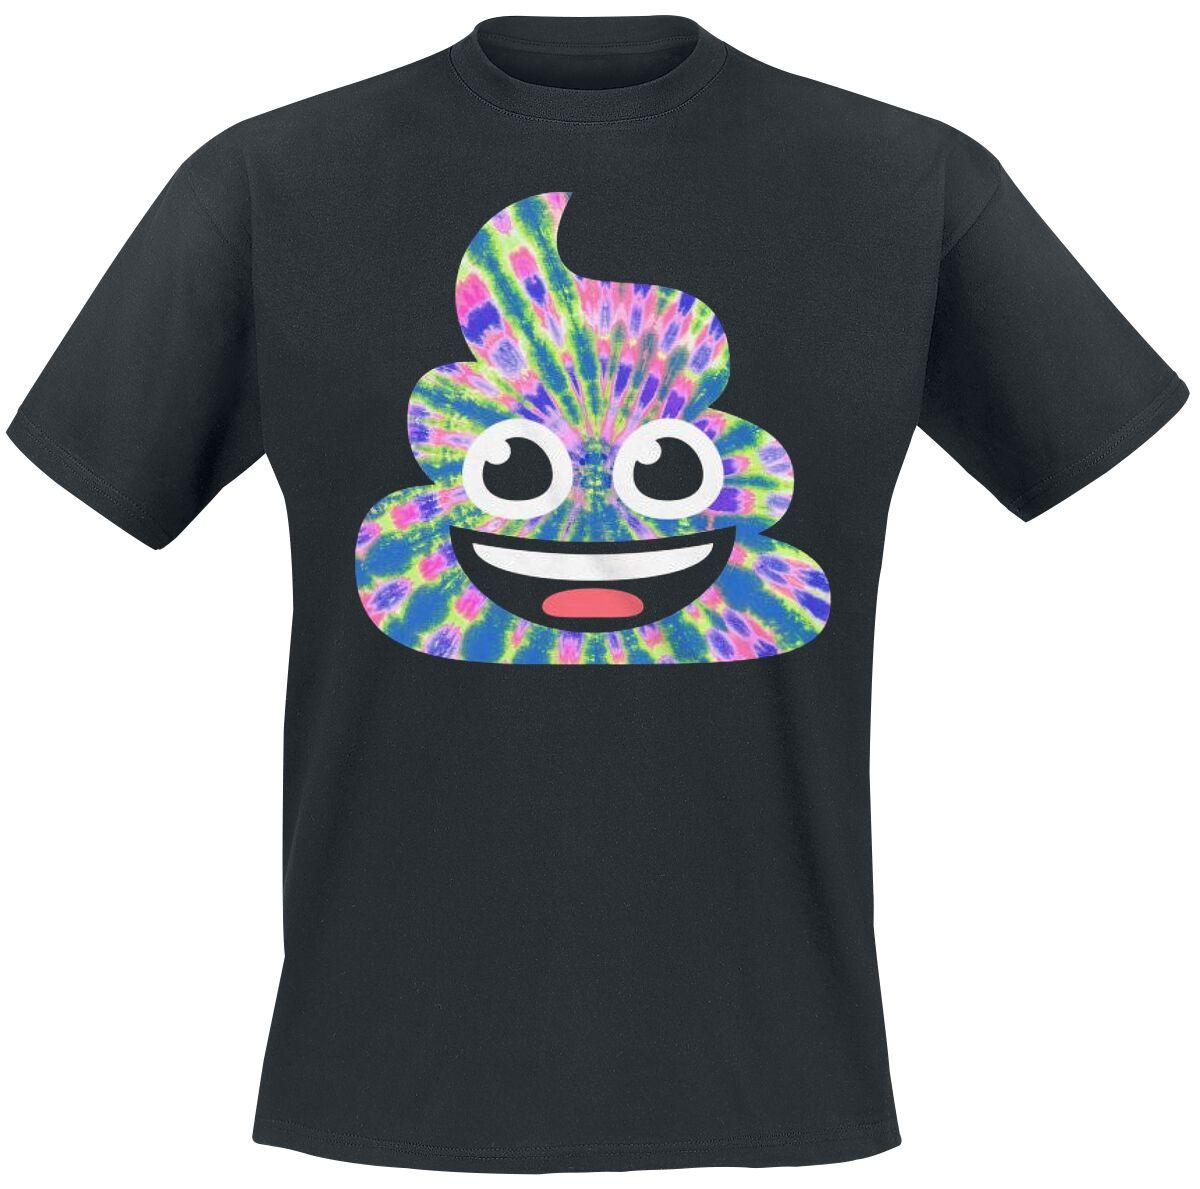 Fun Shirts - Koszulki - T-Shirt Emoji Tye Dye Poo T-Shirt czarny - 356249